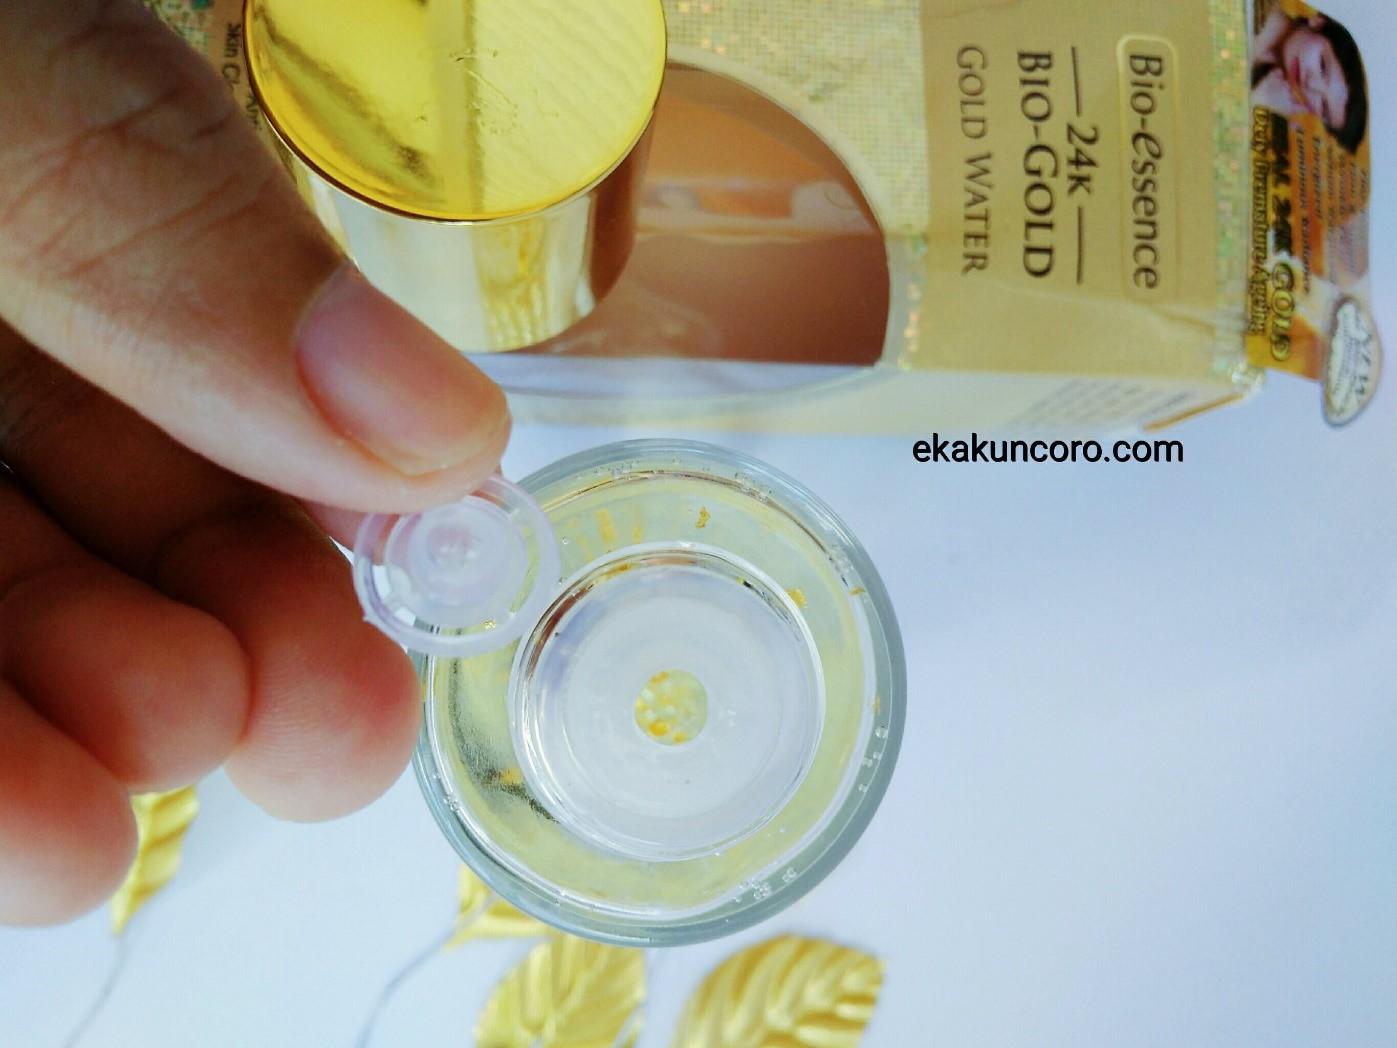 Kemasan Botol BIO-ESSENCE 24K BIO-GOLD GOLD WATER Review Eka-3